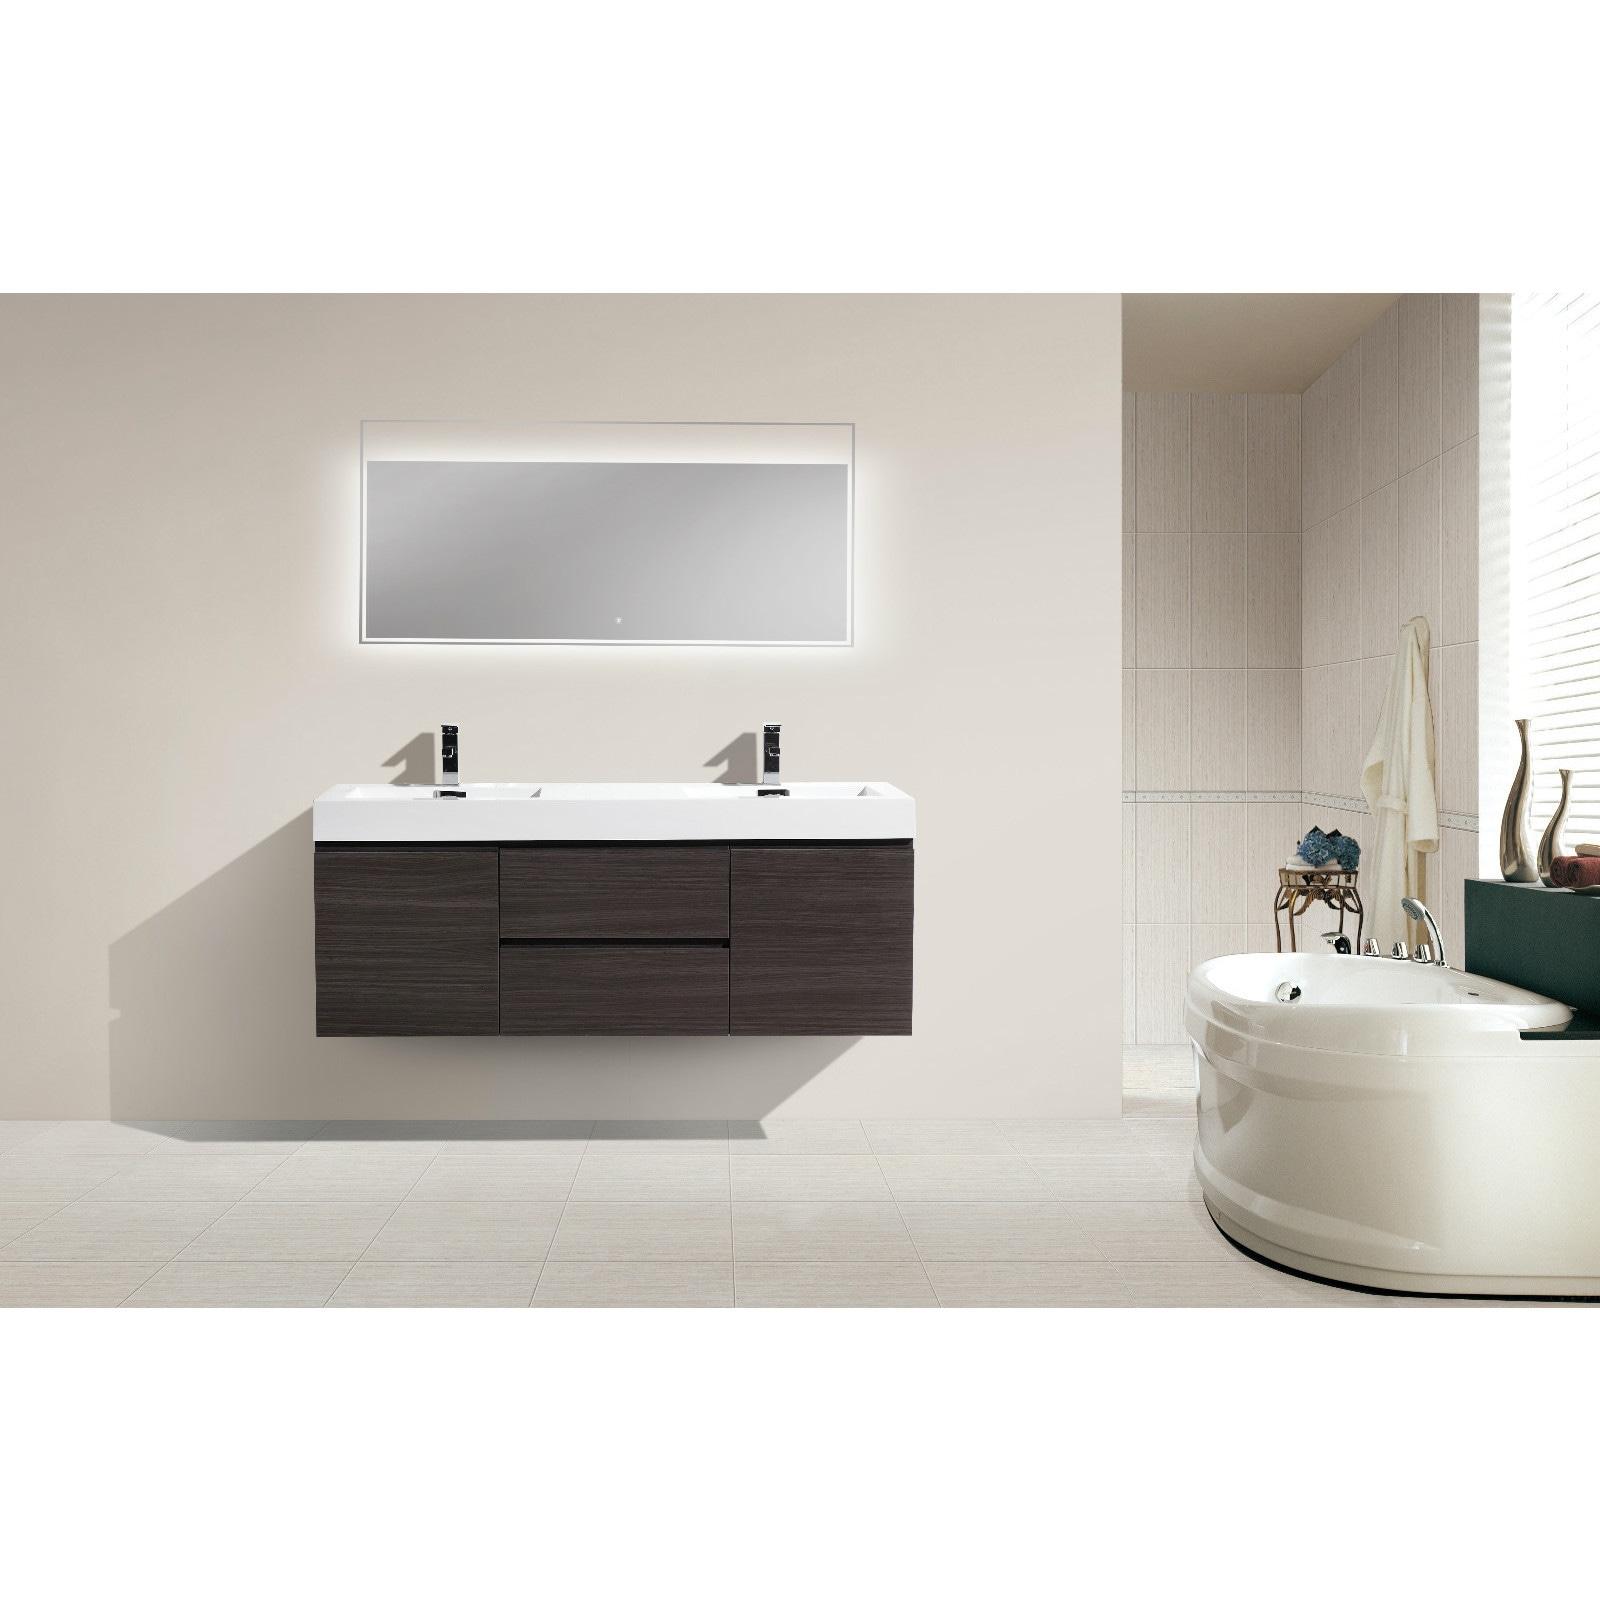 Shop Moreno Bath MOF 60 Inch Wall Mounted Modern Bathroom Vanity ...